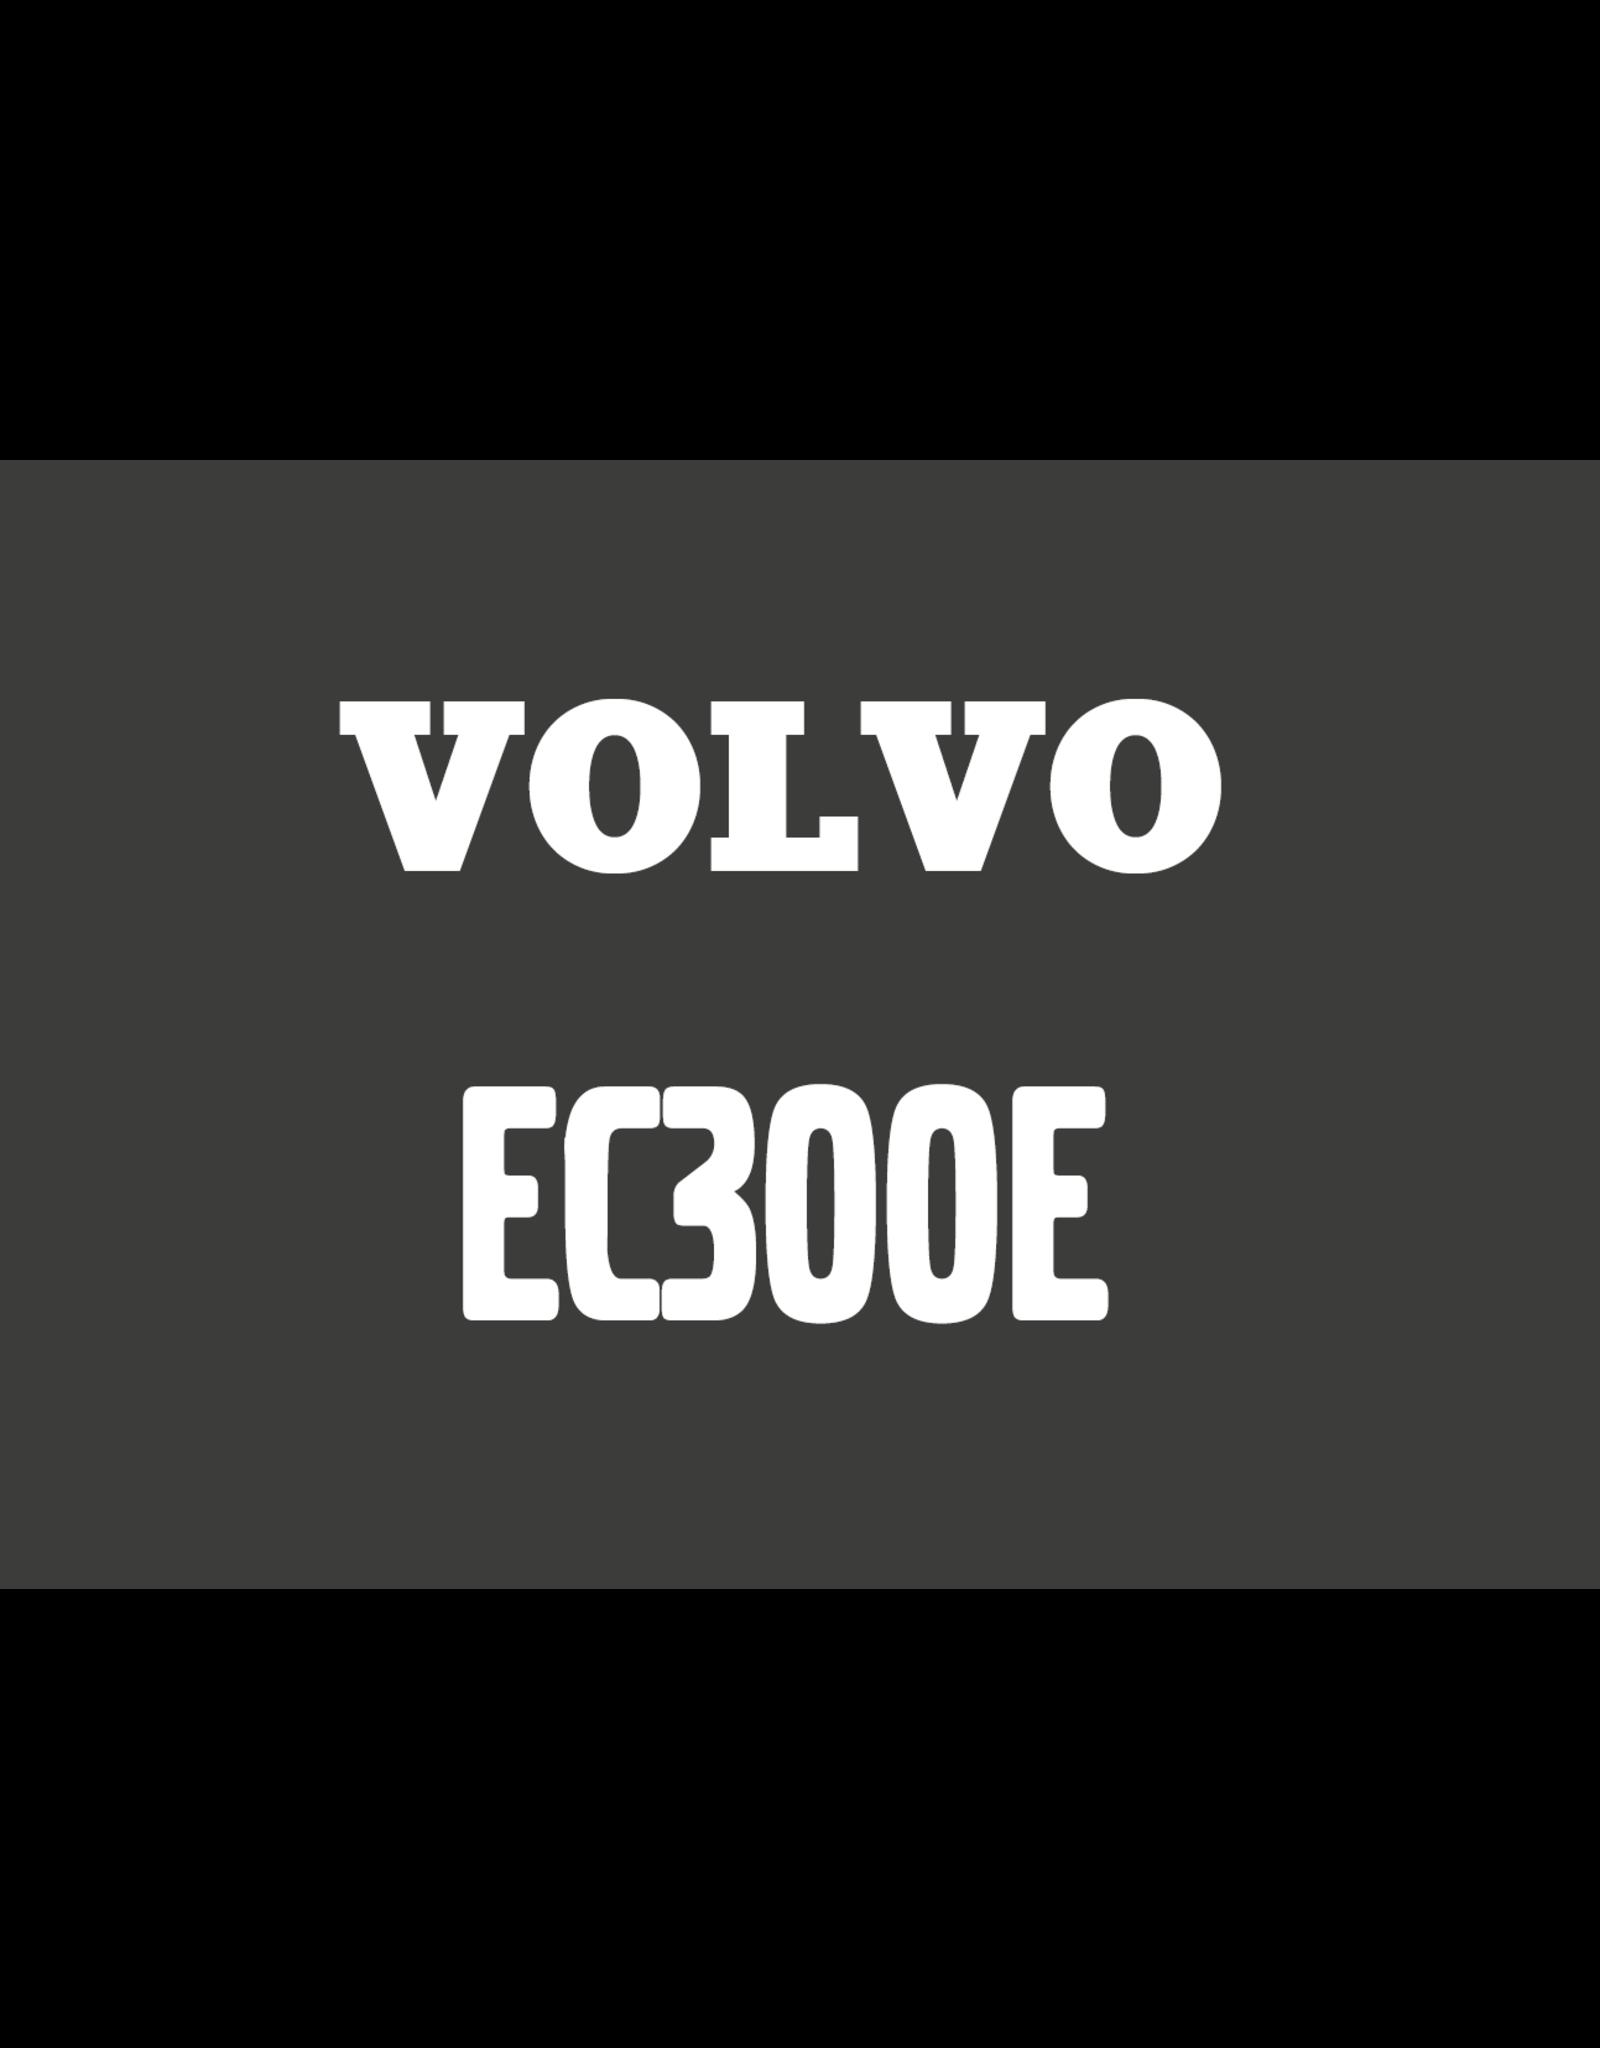 Echle Hartstahl GmbH FOPS für Volvo EC300E